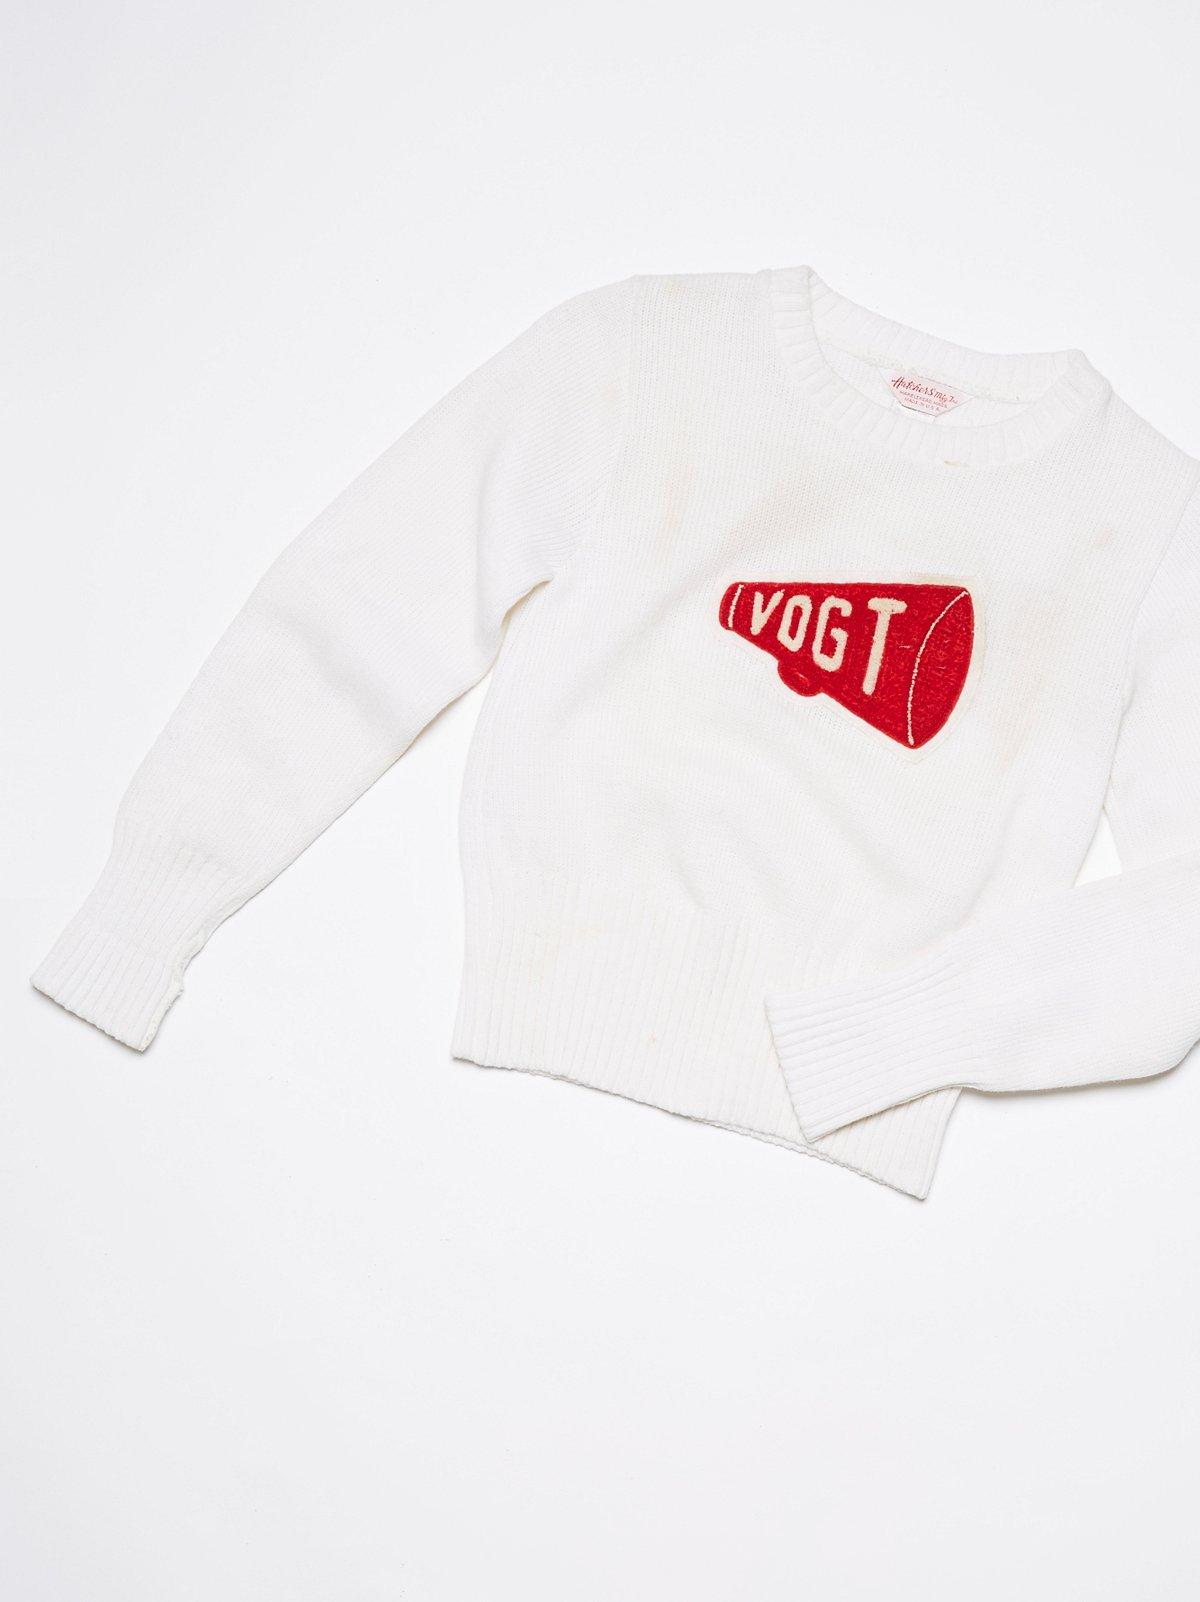 Vintage 1950s Cheerleader Sweater